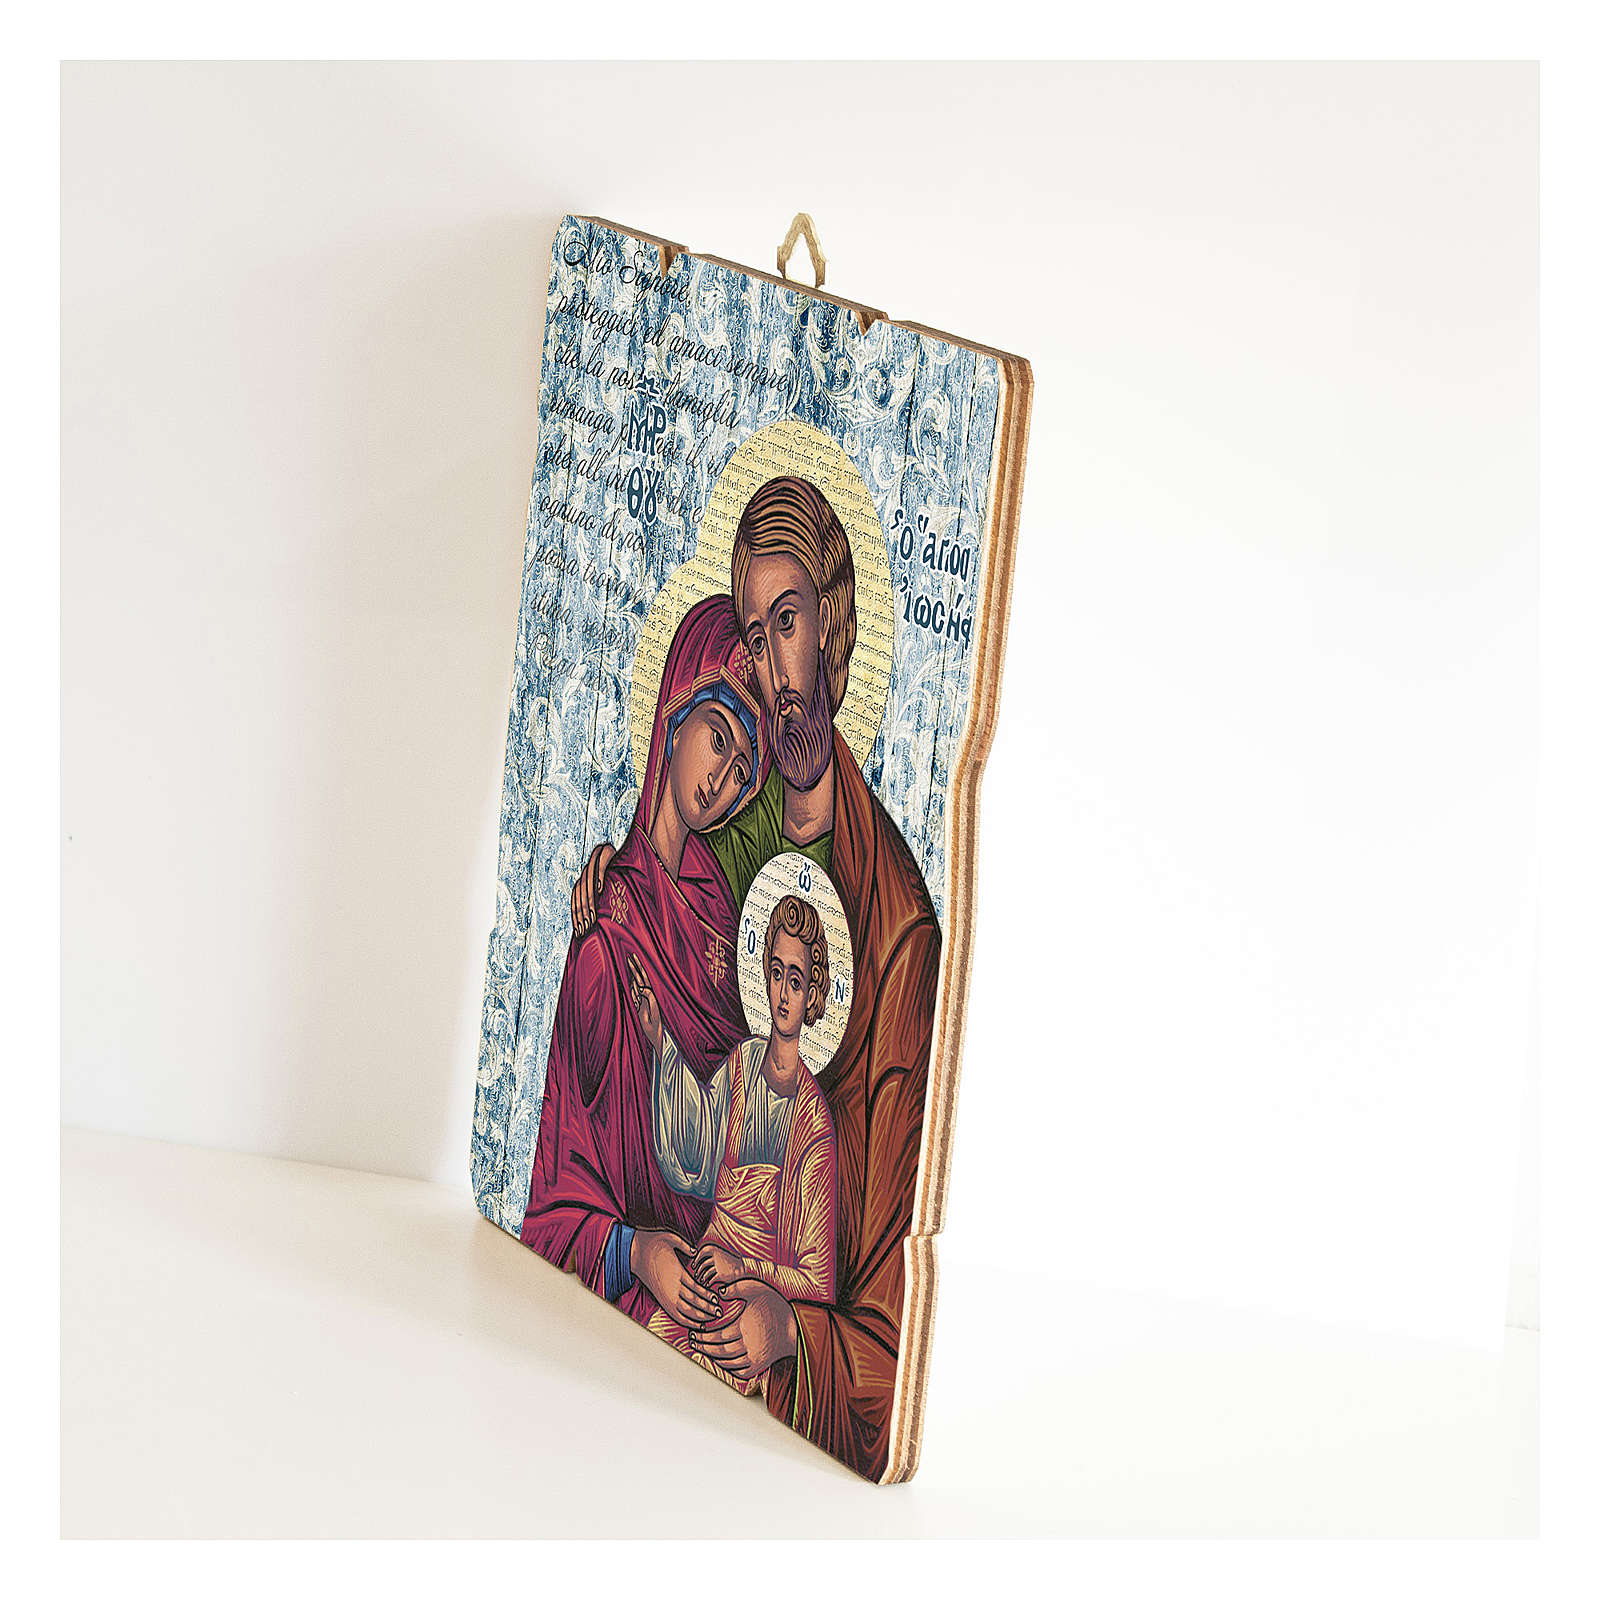 Cuadro madera perfilada gancho parte posterior Icono Sagrada Familia 3